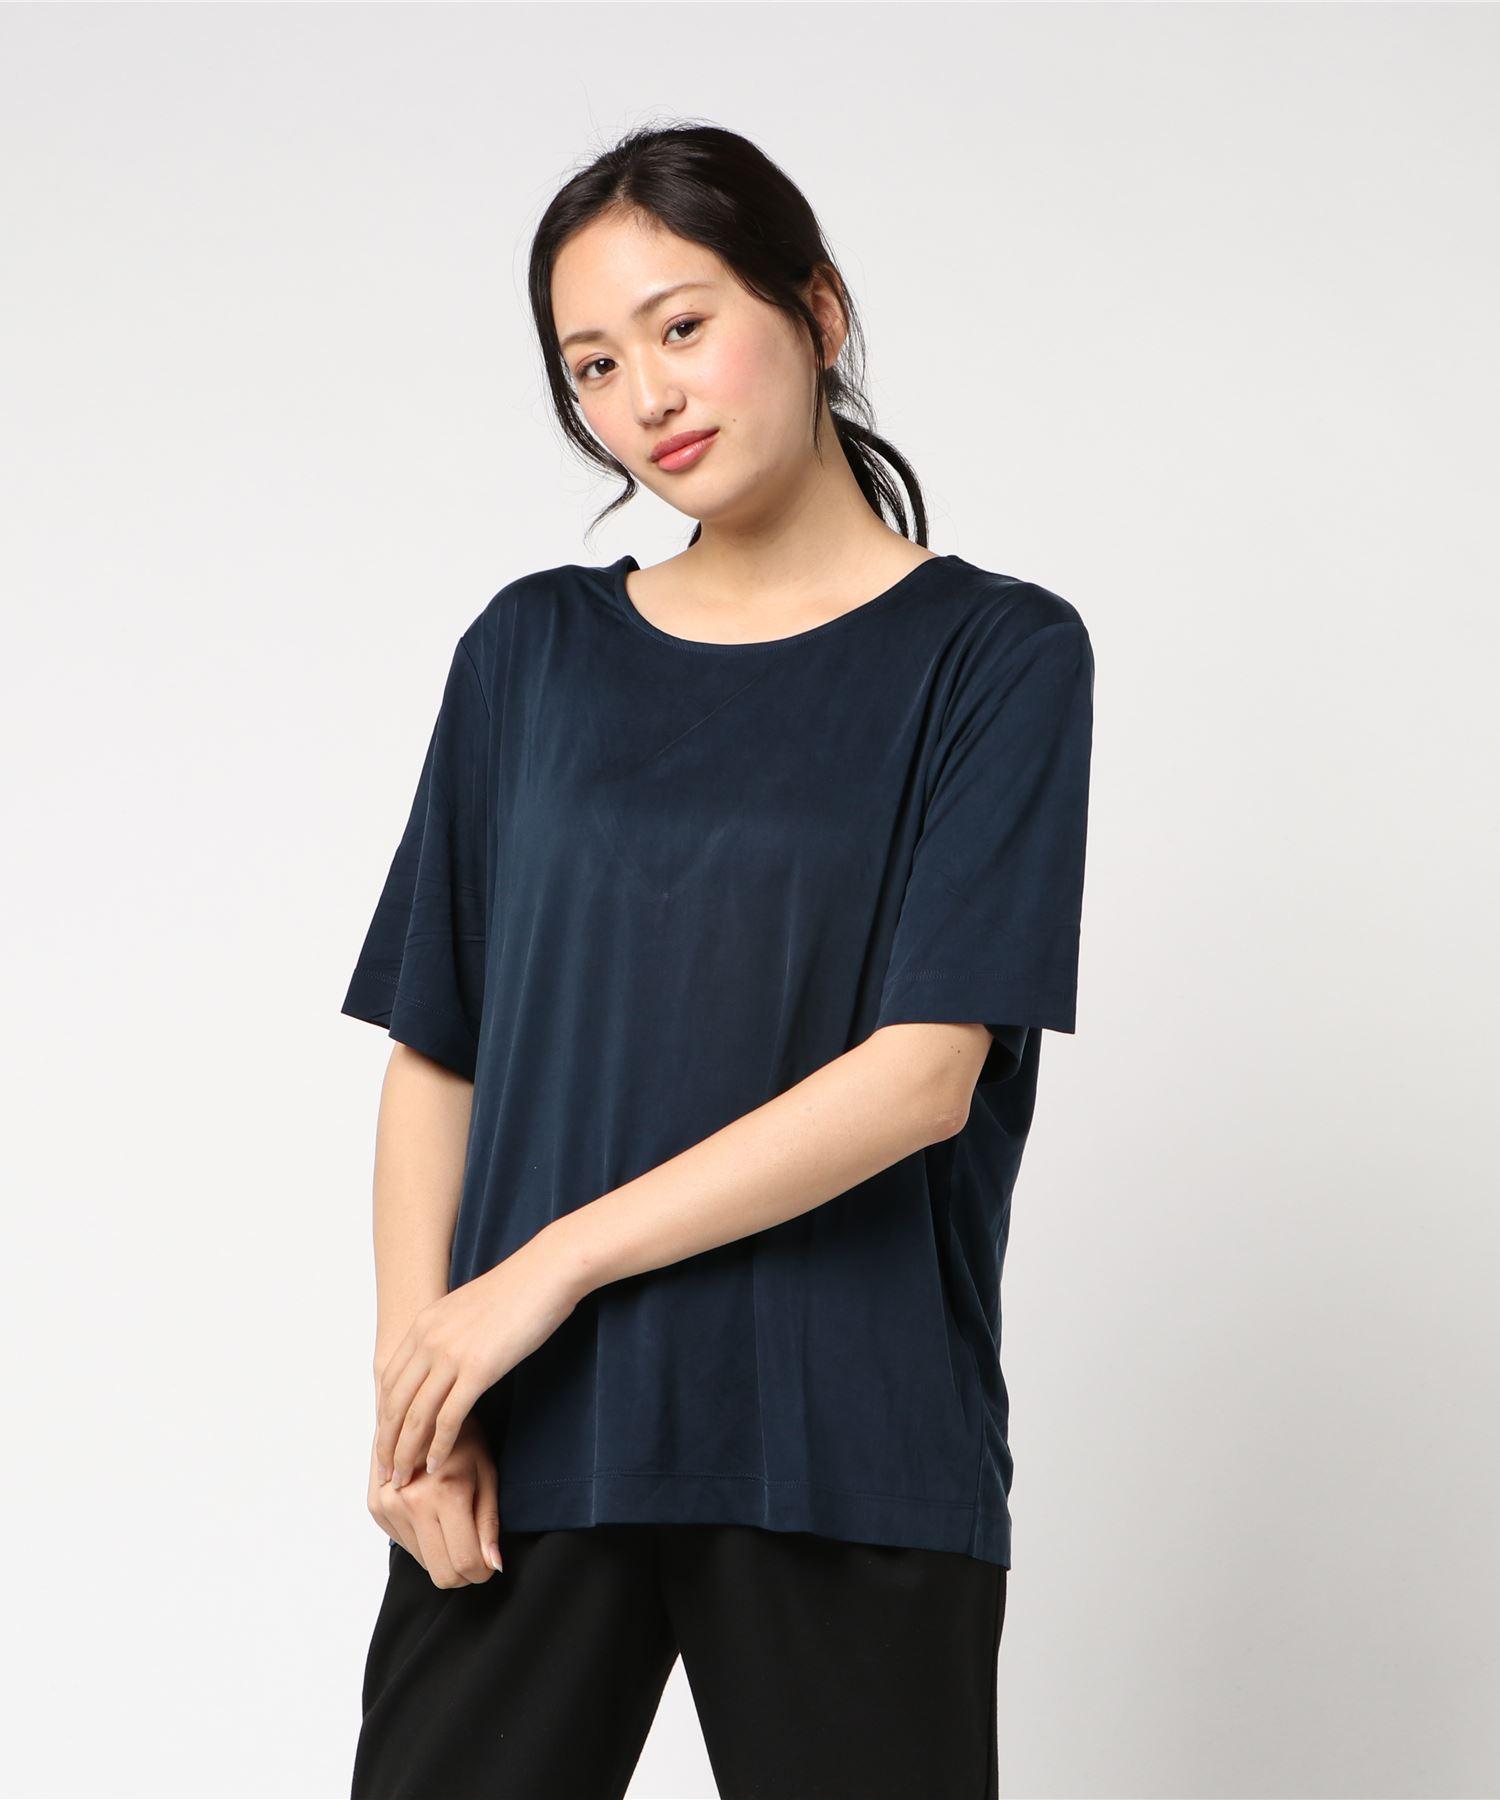 SAMSOE SAMSOE サムソエ サムソエ/Tシャツ